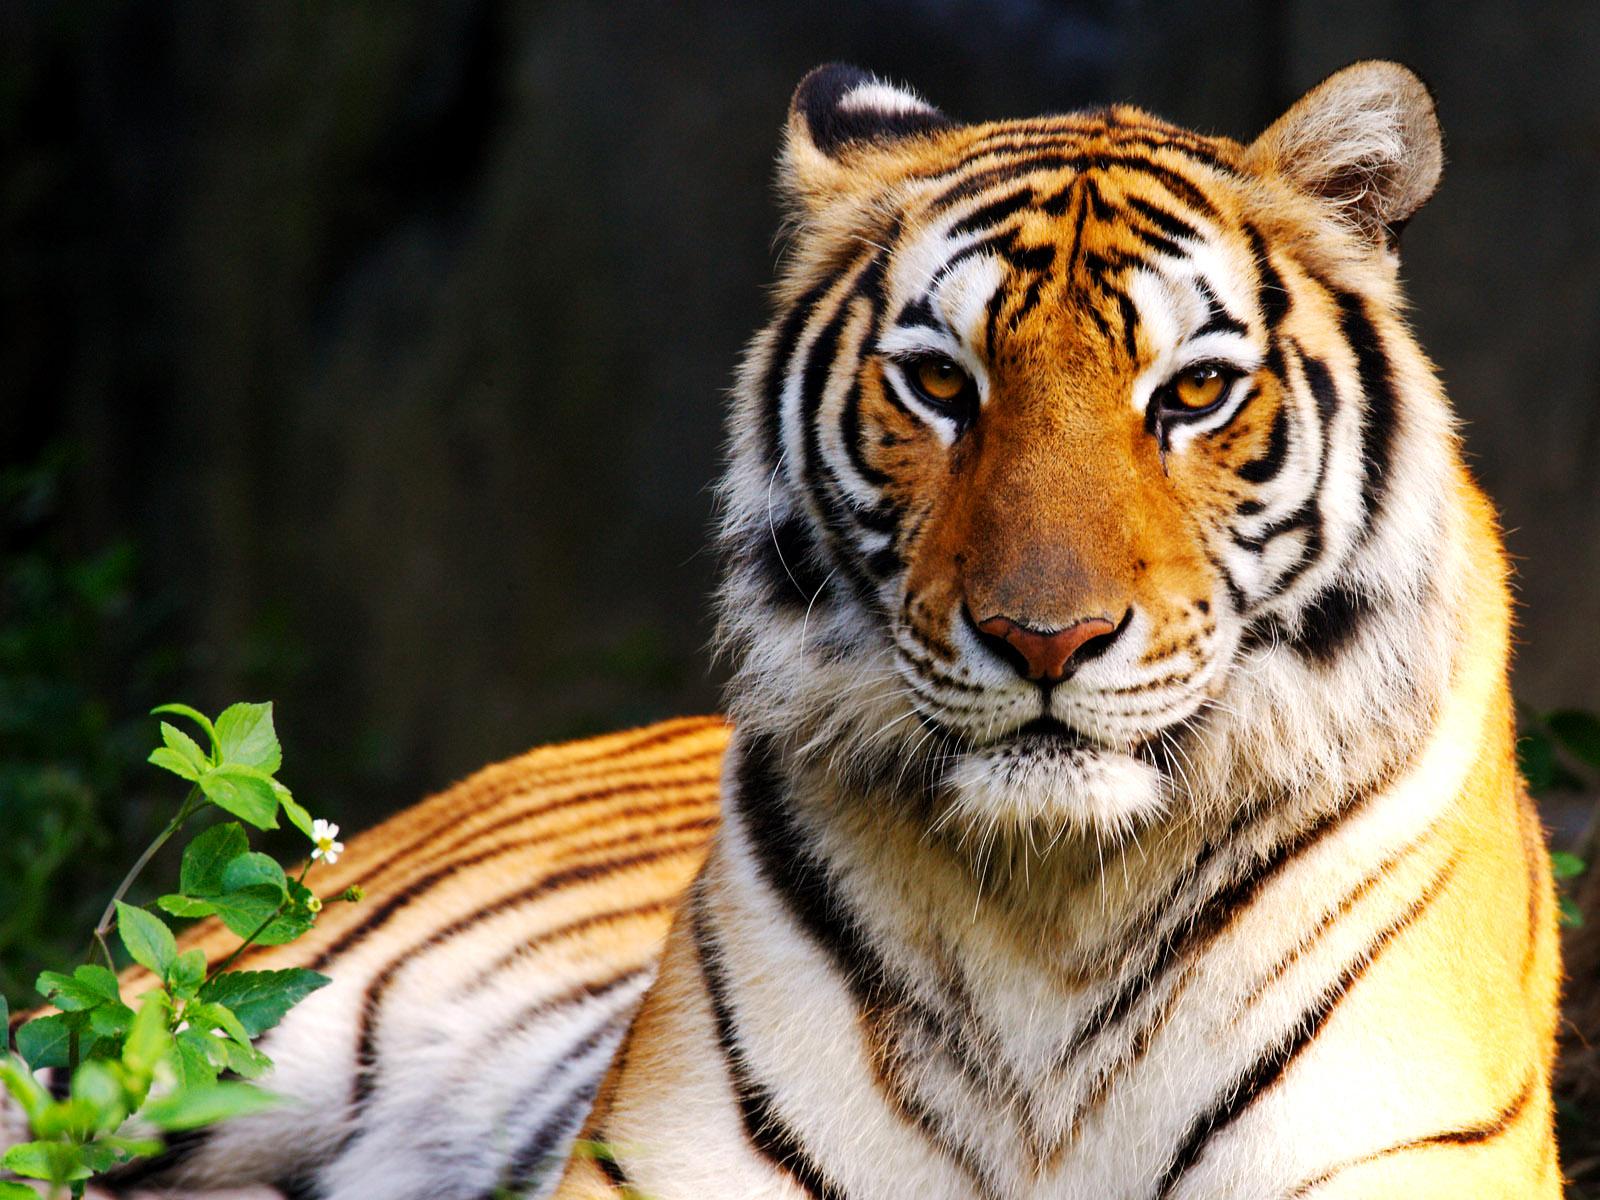 Colors of Nature Tiger HD Wallpapers Desktop Wallpapers 1600x1200